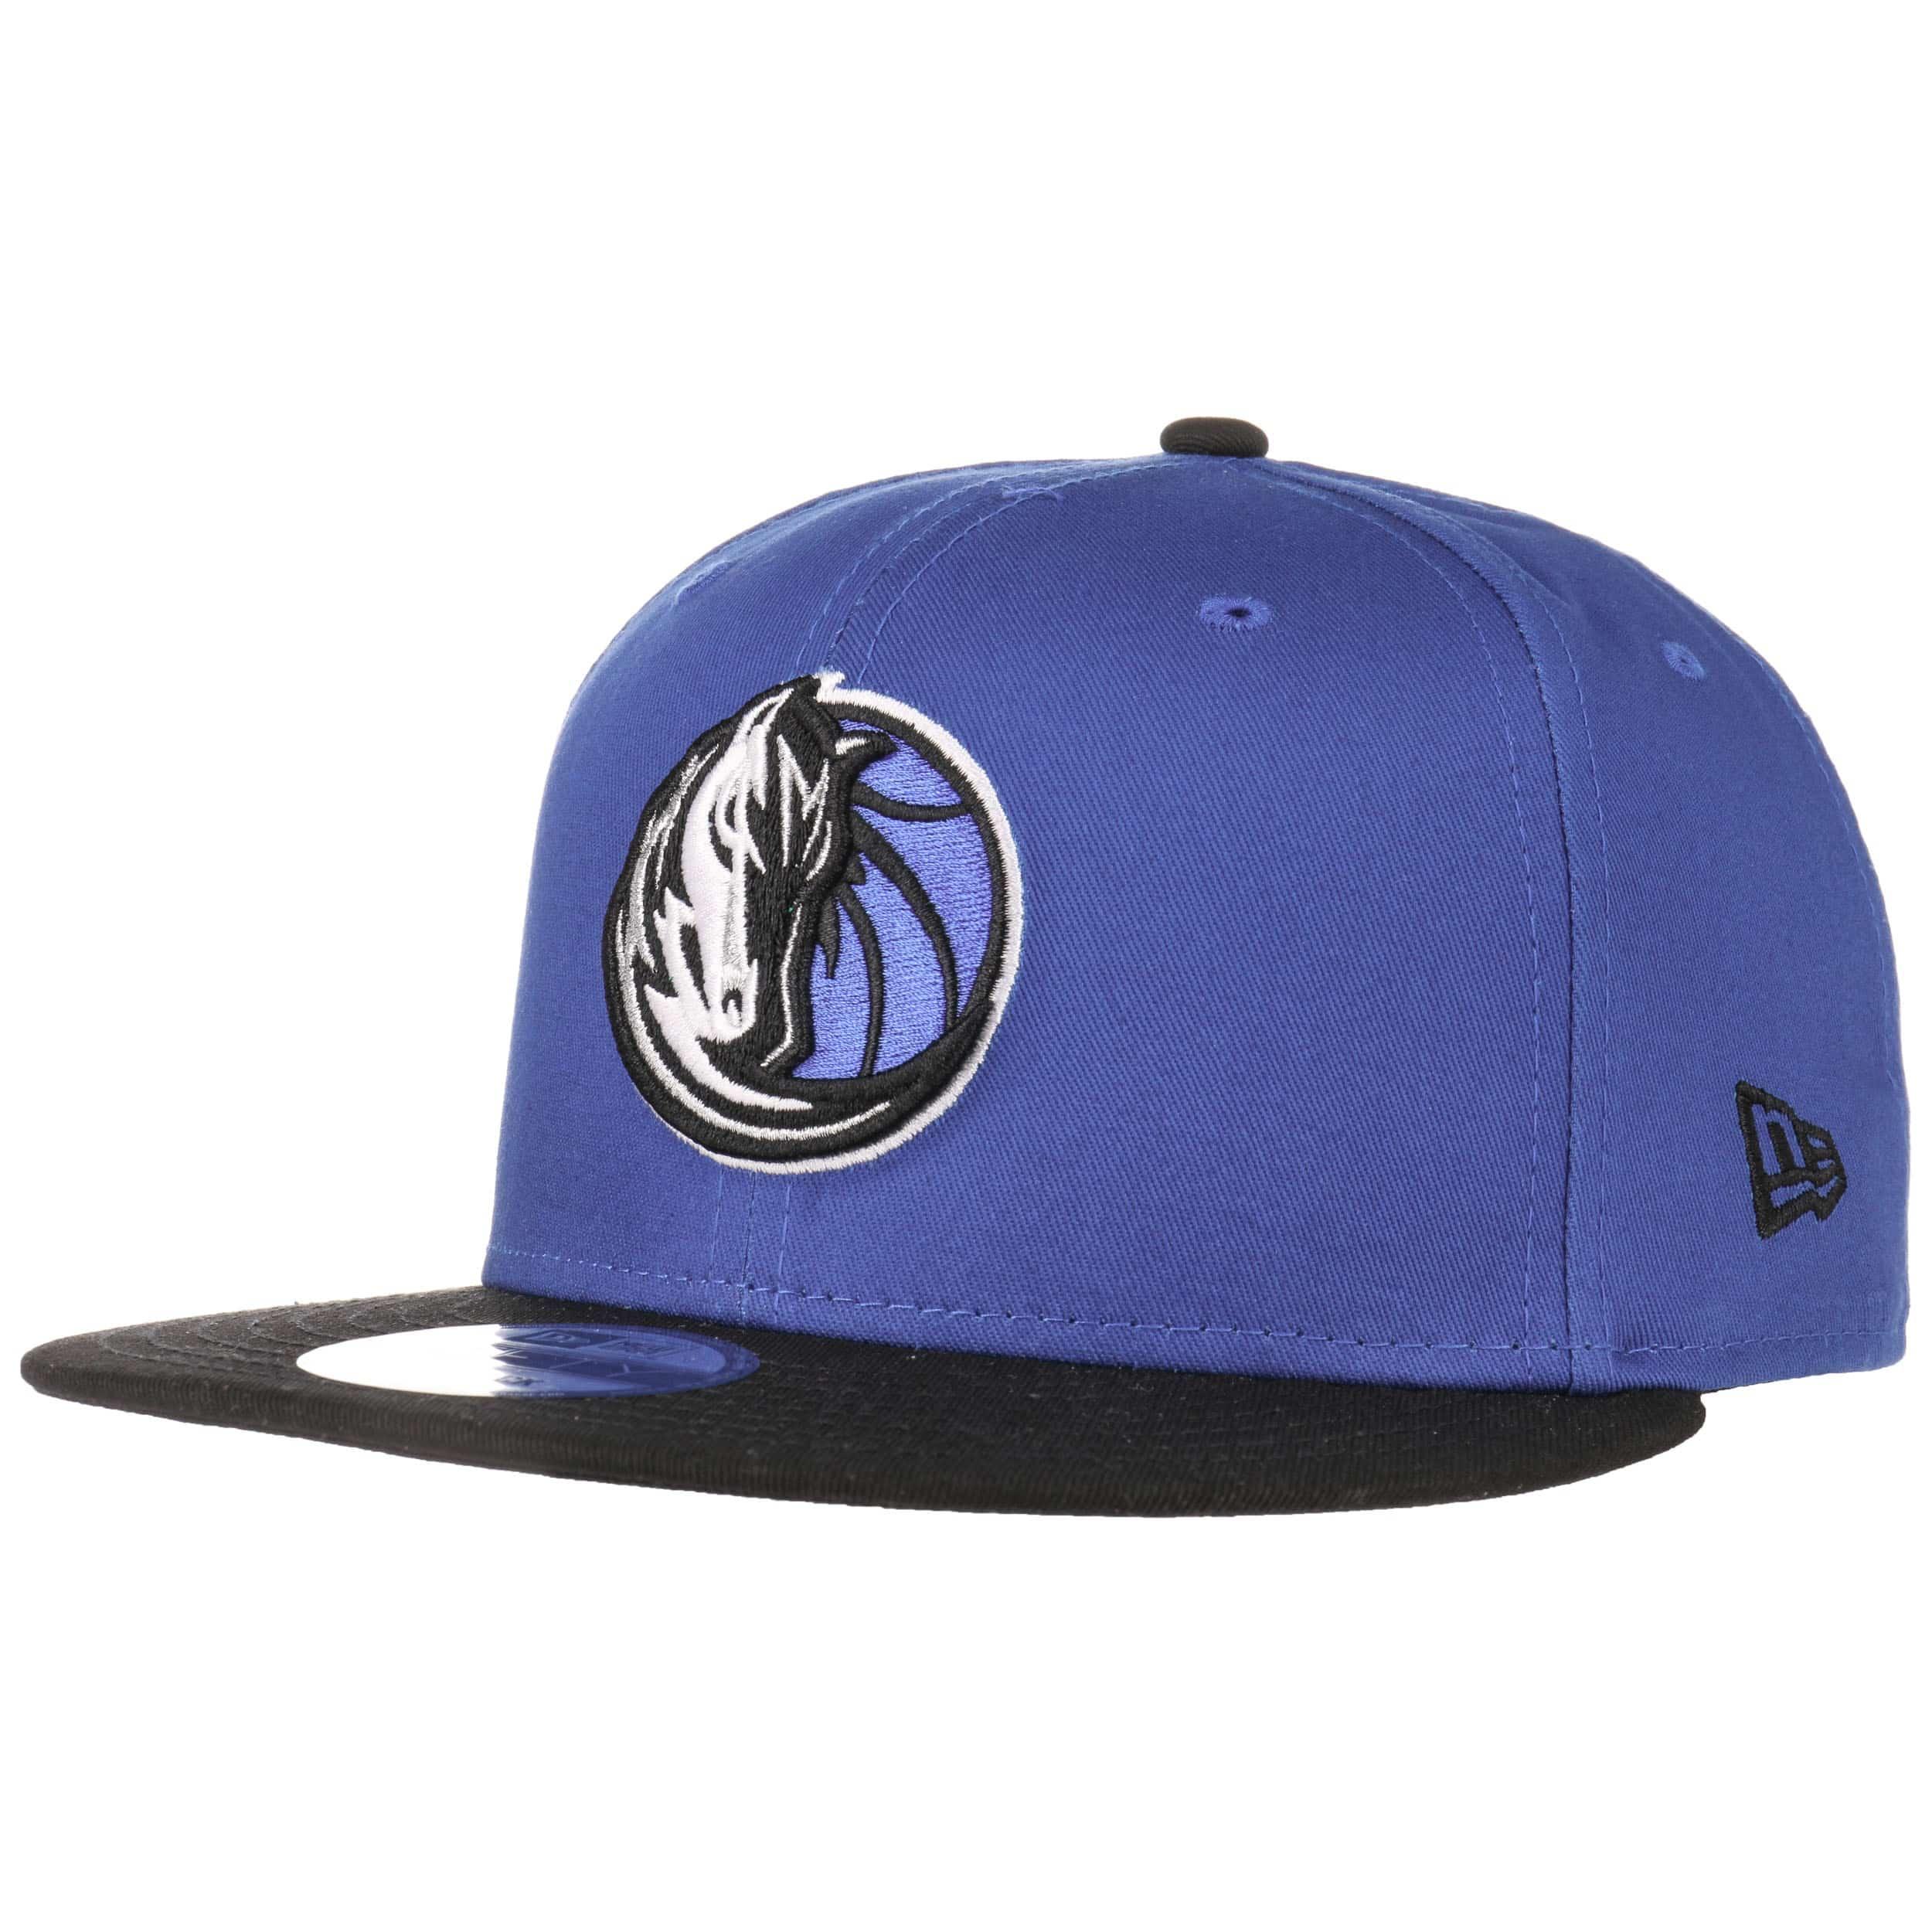 online store 6611c 0140f ... 9Fifty TC Dallas Mavericks Cap by New Era - blue 7